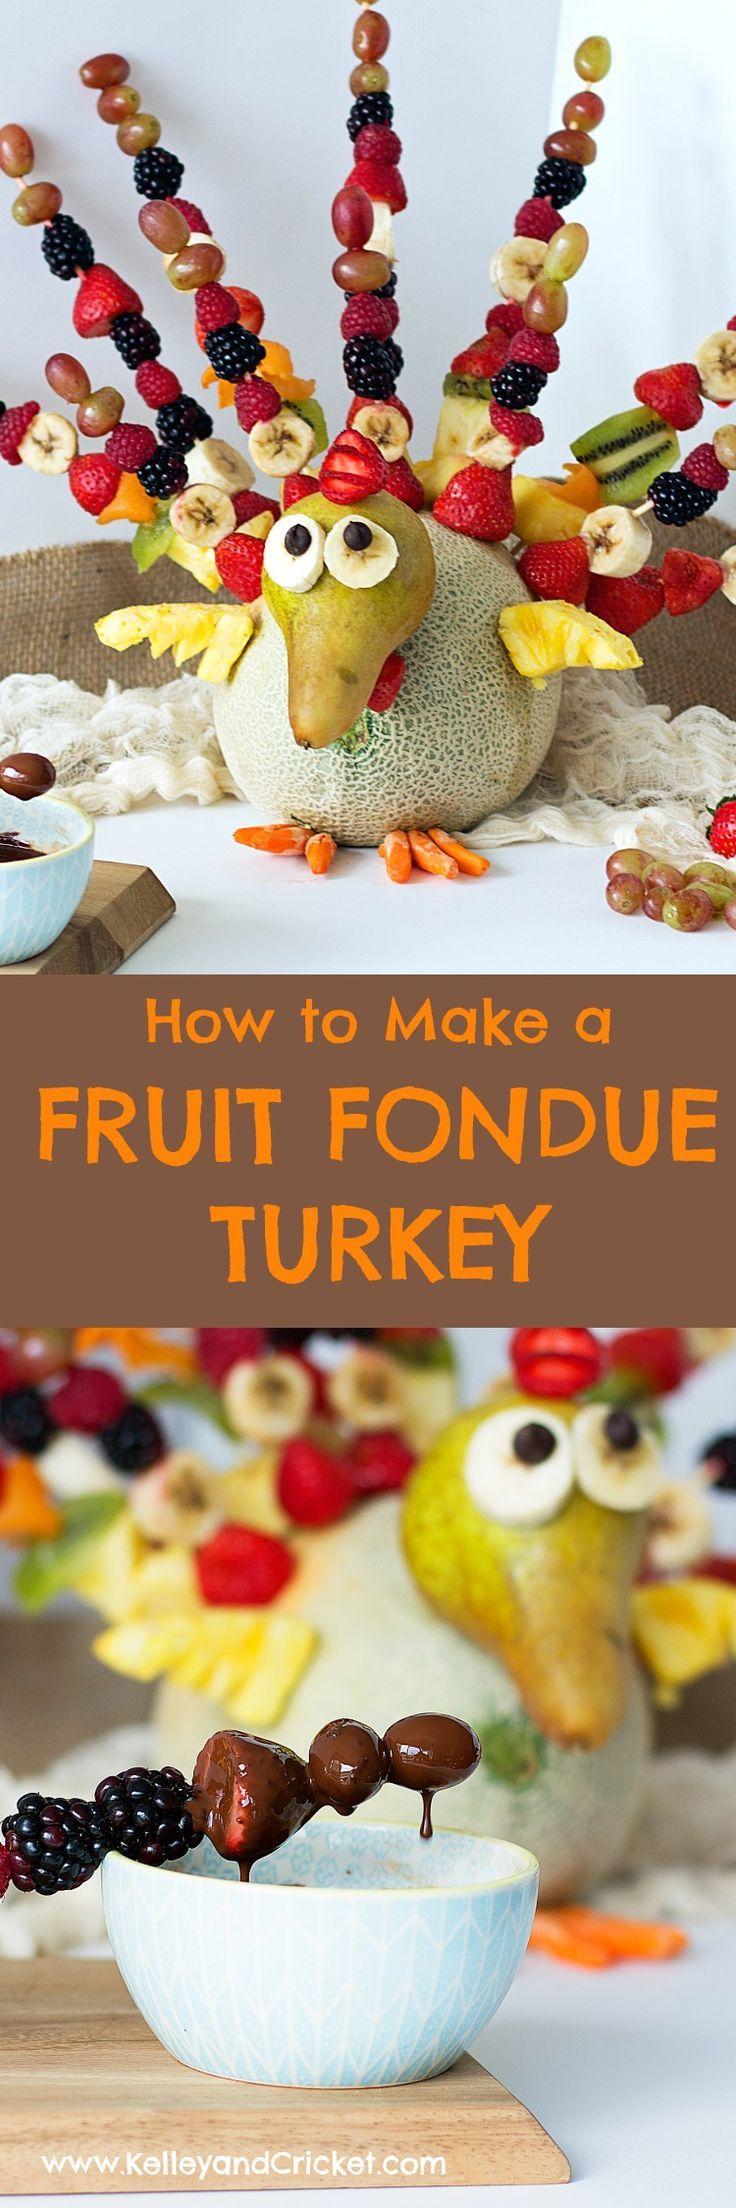 FRUIT TURKEY with CHOCOLATE FONDUE {VIDEO!}{Grain-Free,Paleo}